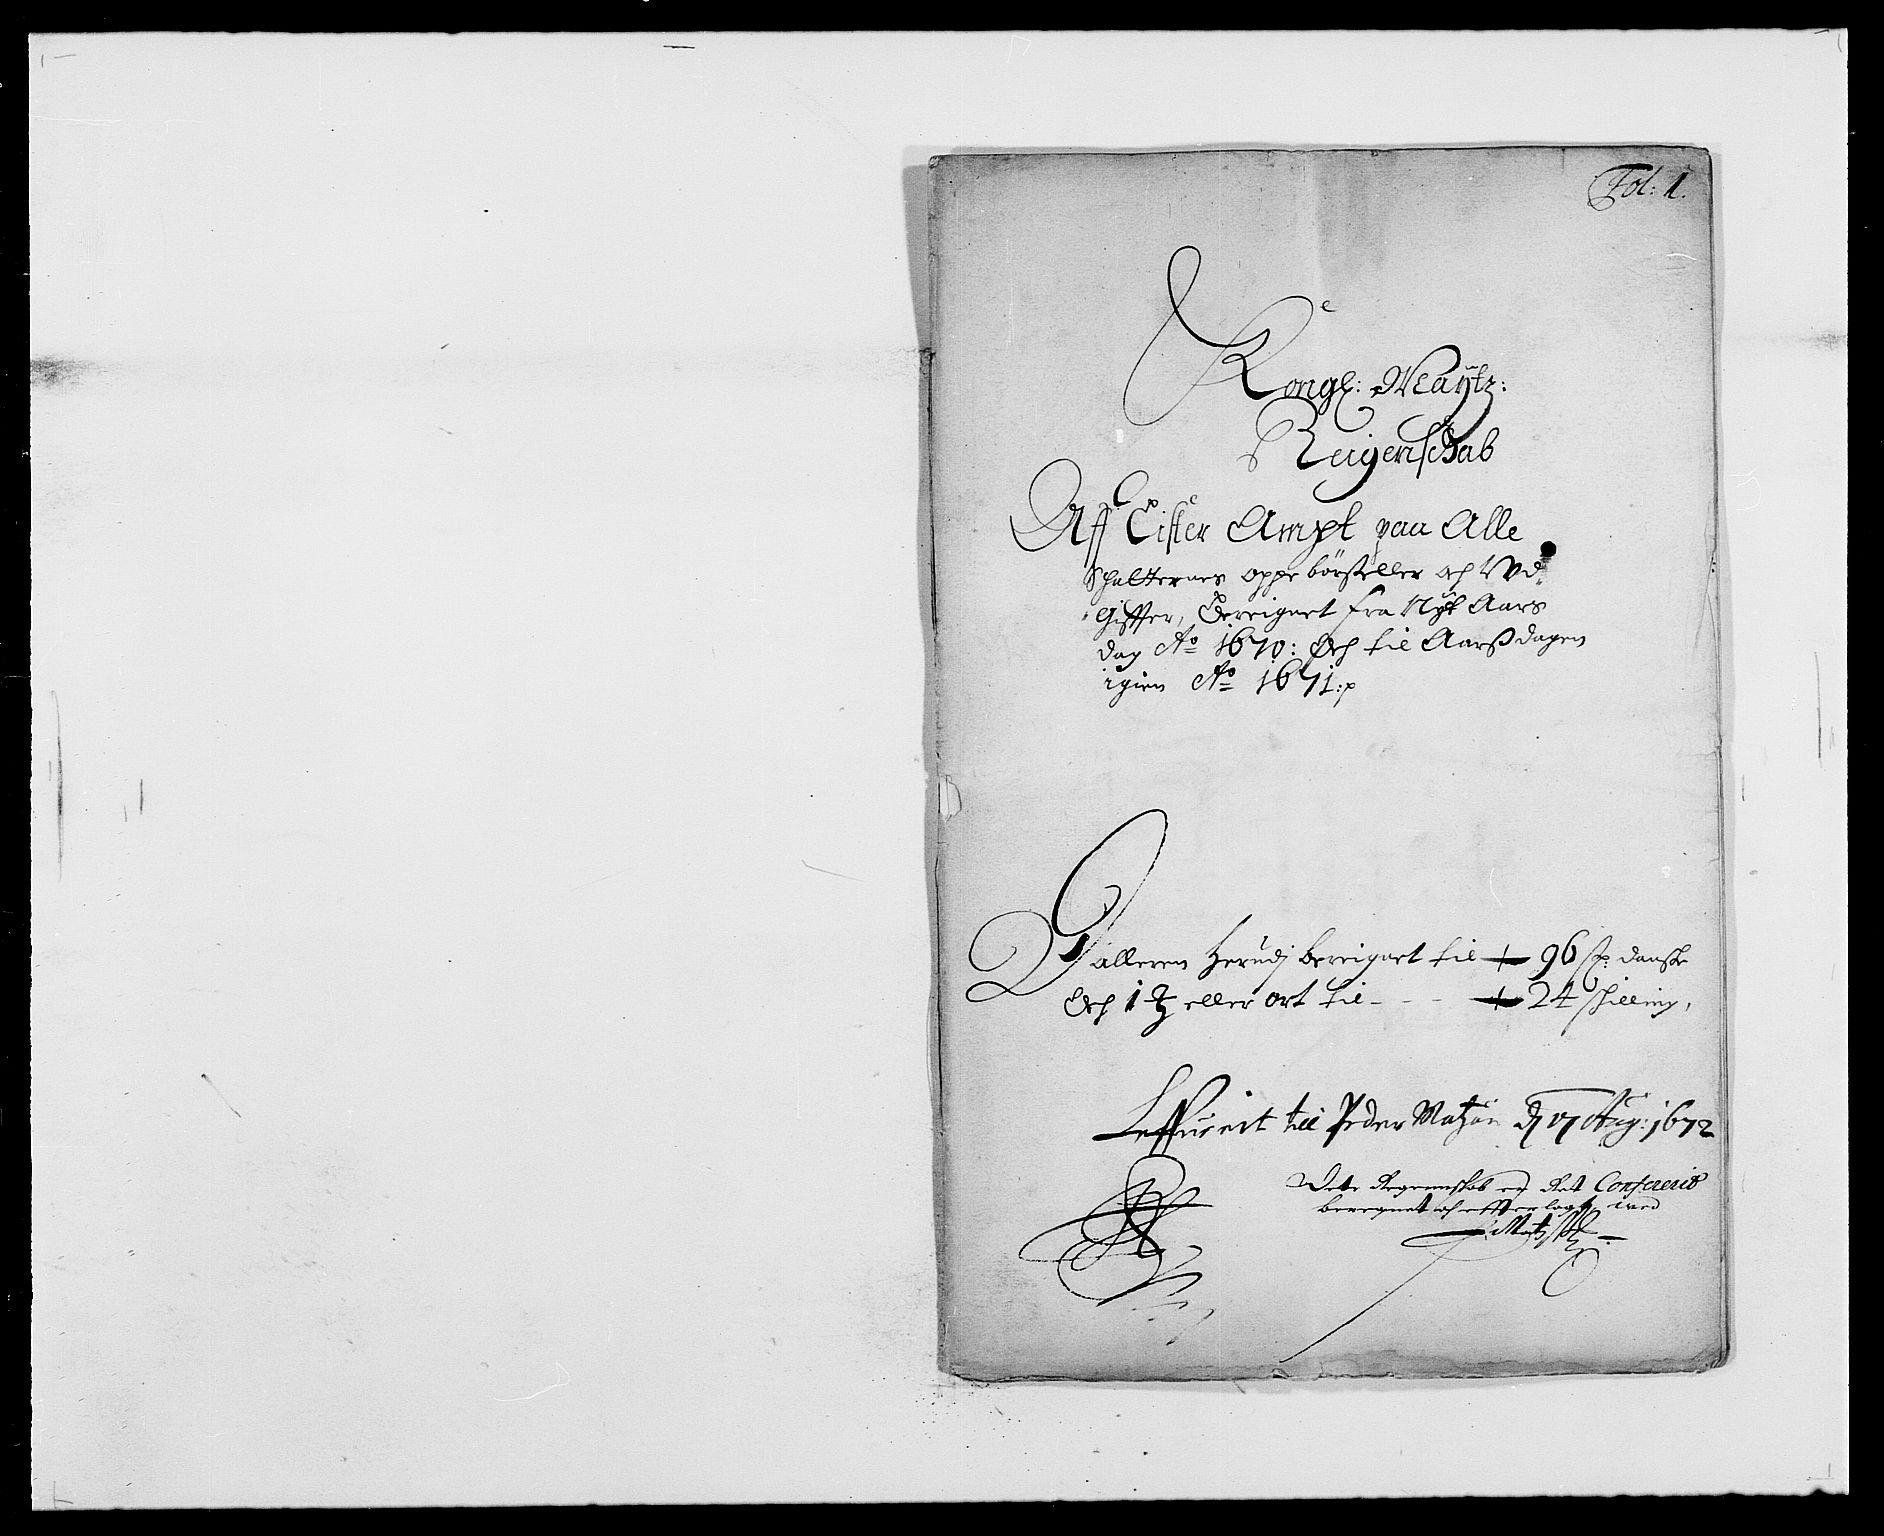 RA, Rentekammeret inntil 1814, Reviderte regnskaper, Fogderegnskap, R41/L2525: Fogderegnskap Lista, 1669-1671, s. 78